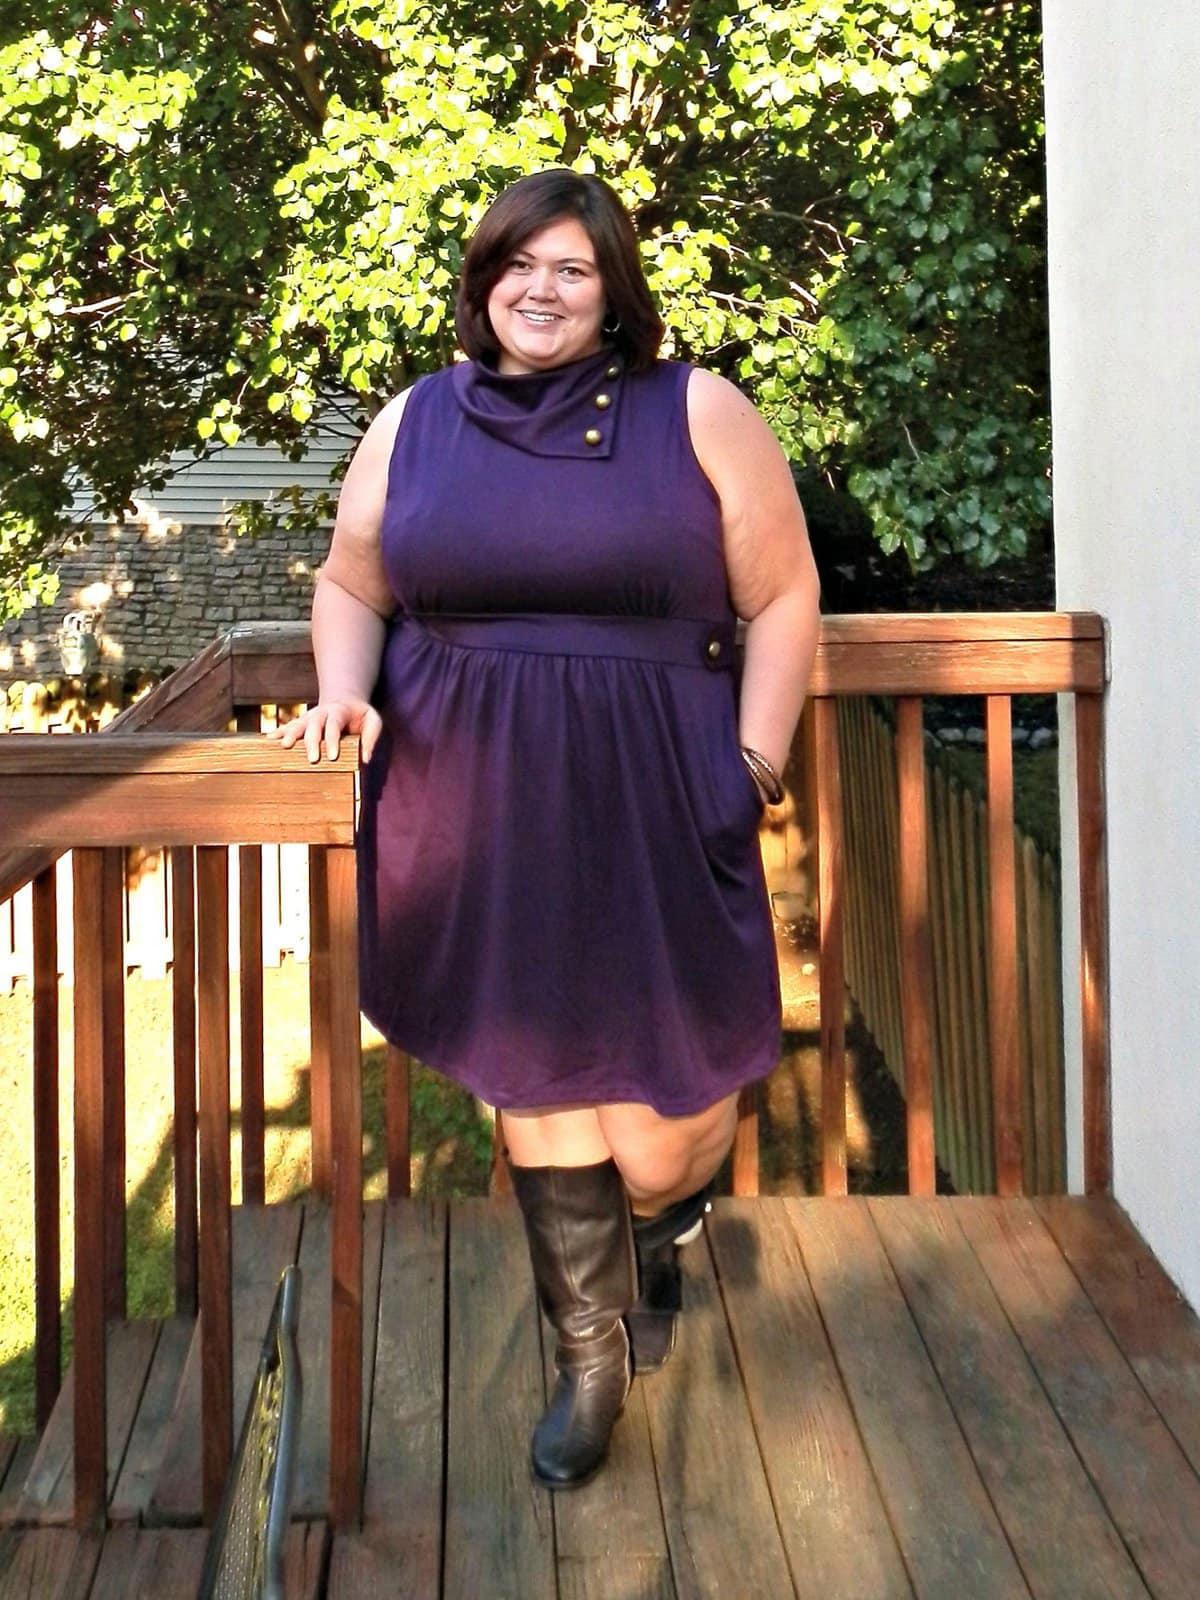 Camoflage Wedding Dress 53 Nice